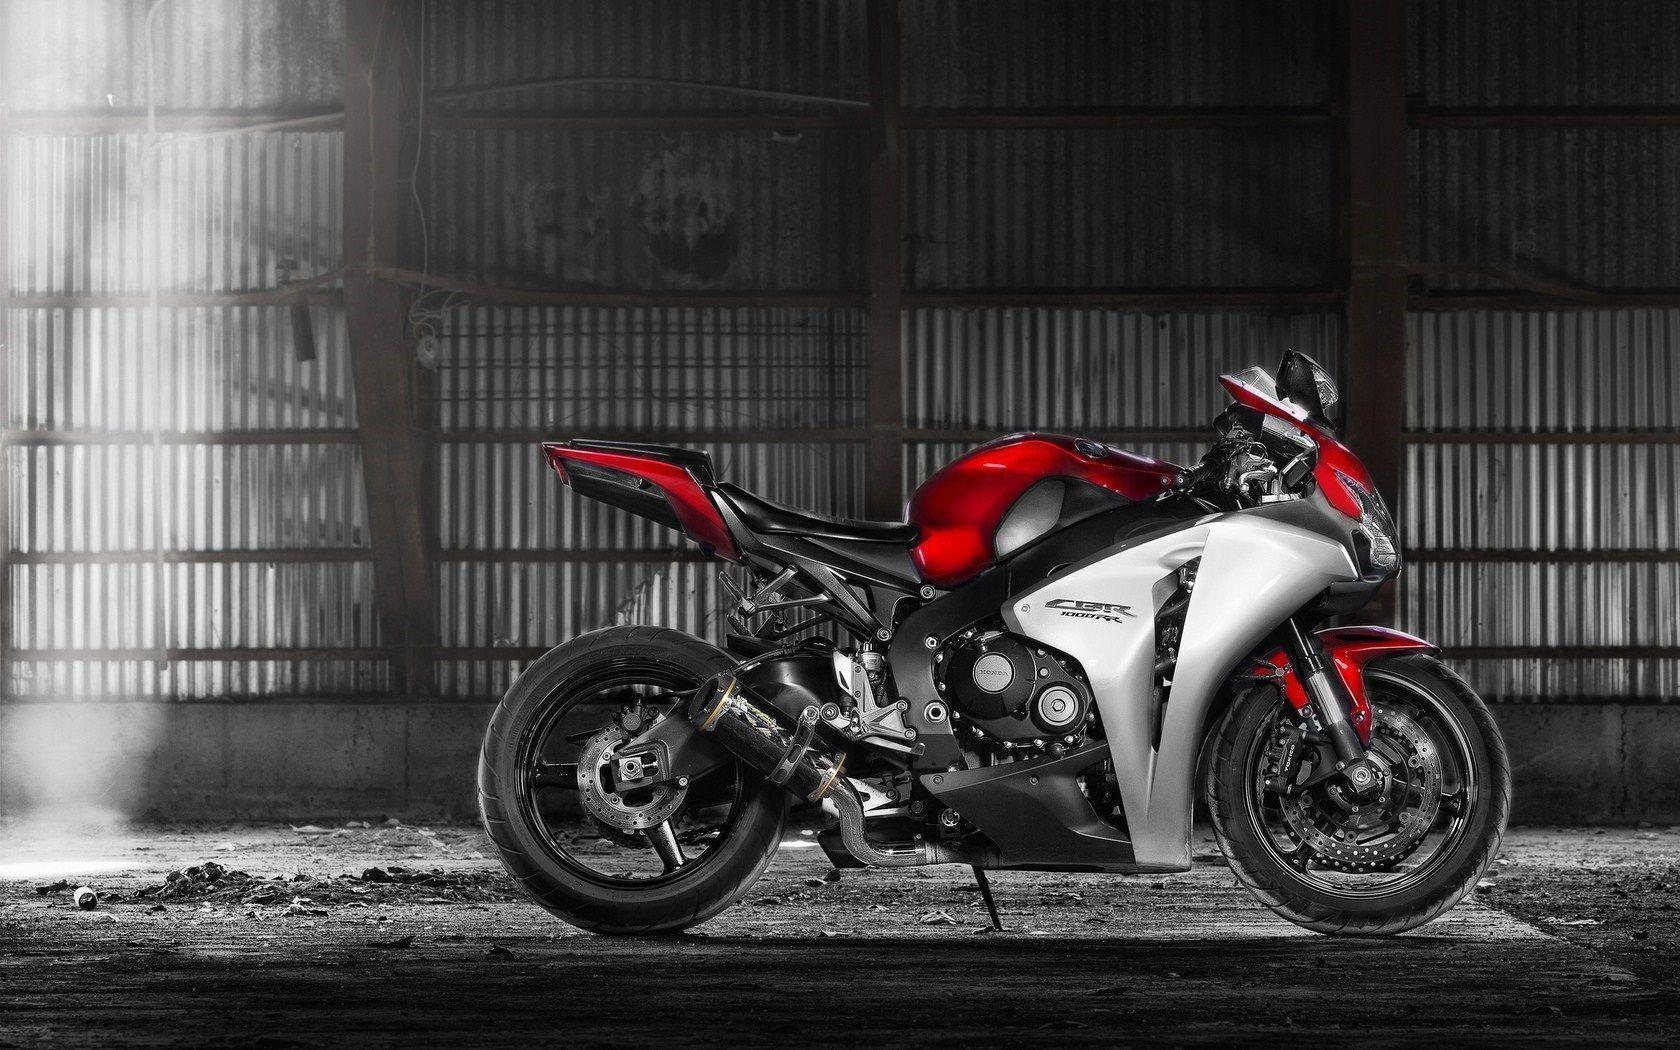 Honda Cbr Motorcycle 4k Hd Desktop Wallpaper For 4k Ultra: New Bike And Car Mobile Wallpapers In 2015